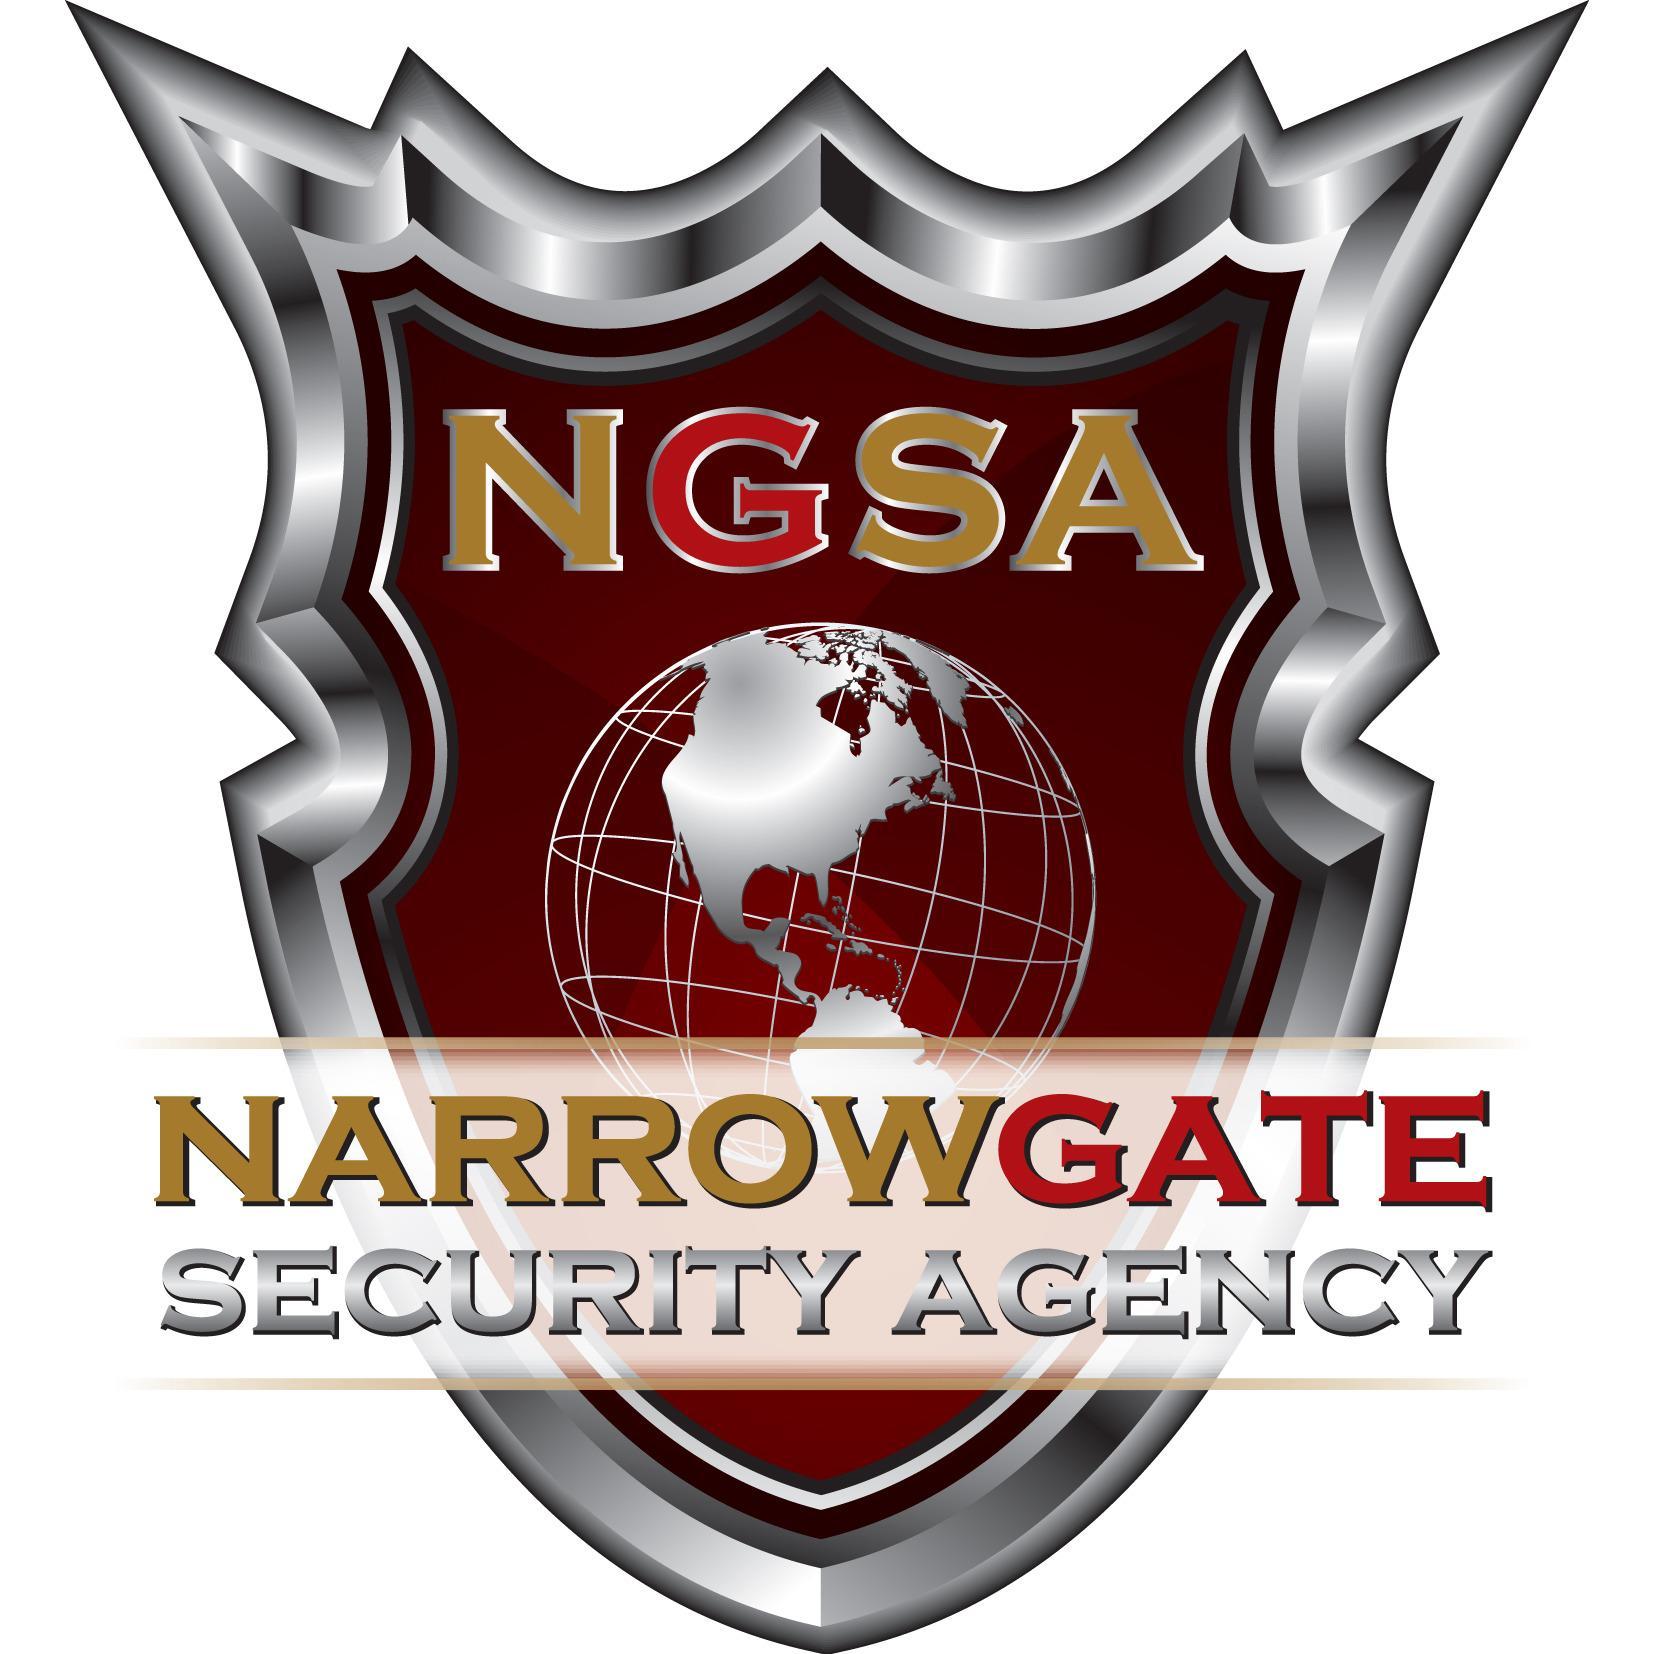 Narrow Gate Security Agency